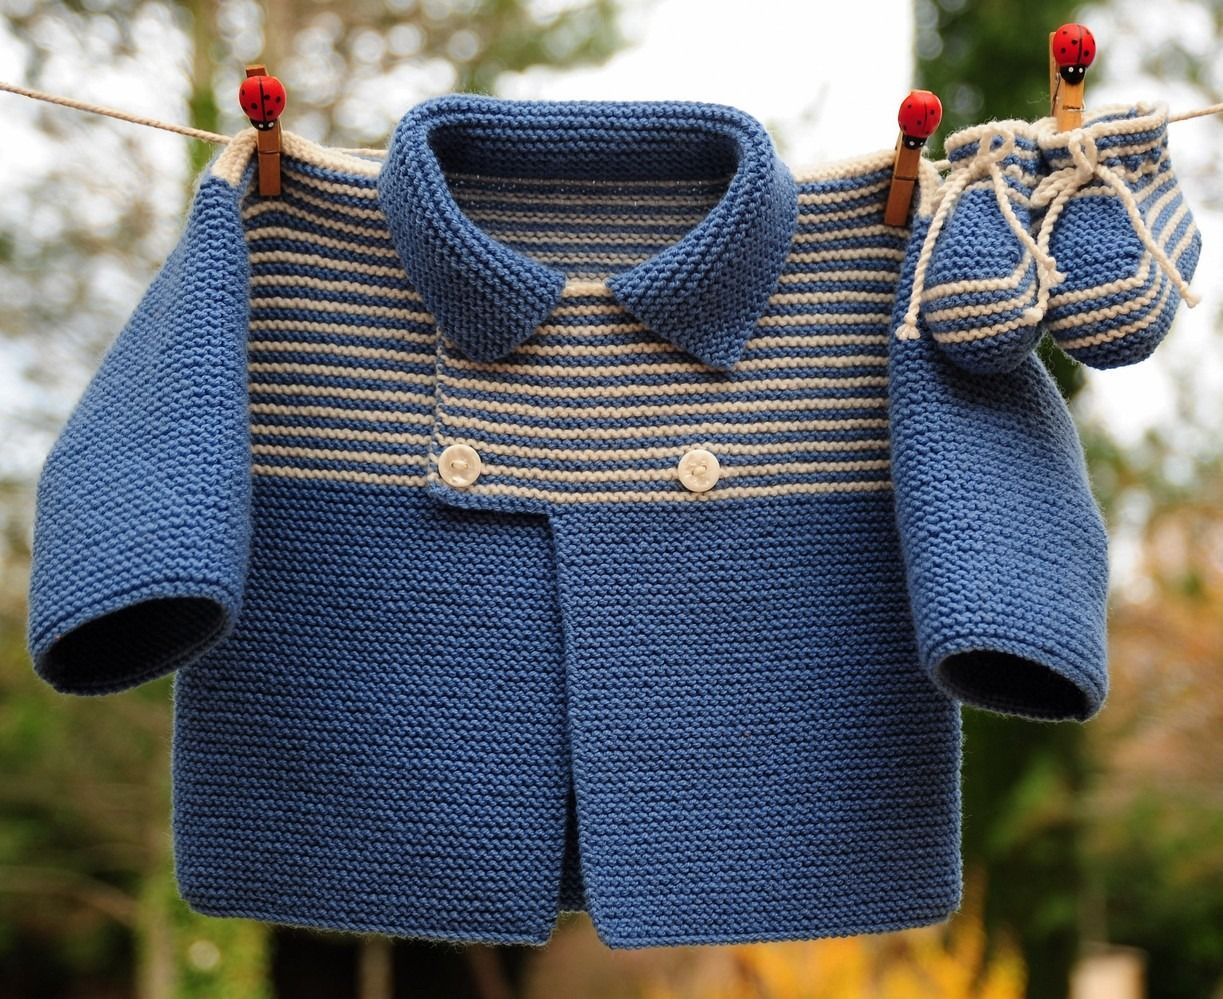 layette ensemble m rinos 3 mois neuf tricot main gilet et chaussons mode b b par com3pom. Black Bedroom Furniture Sets. Home Design Ideas